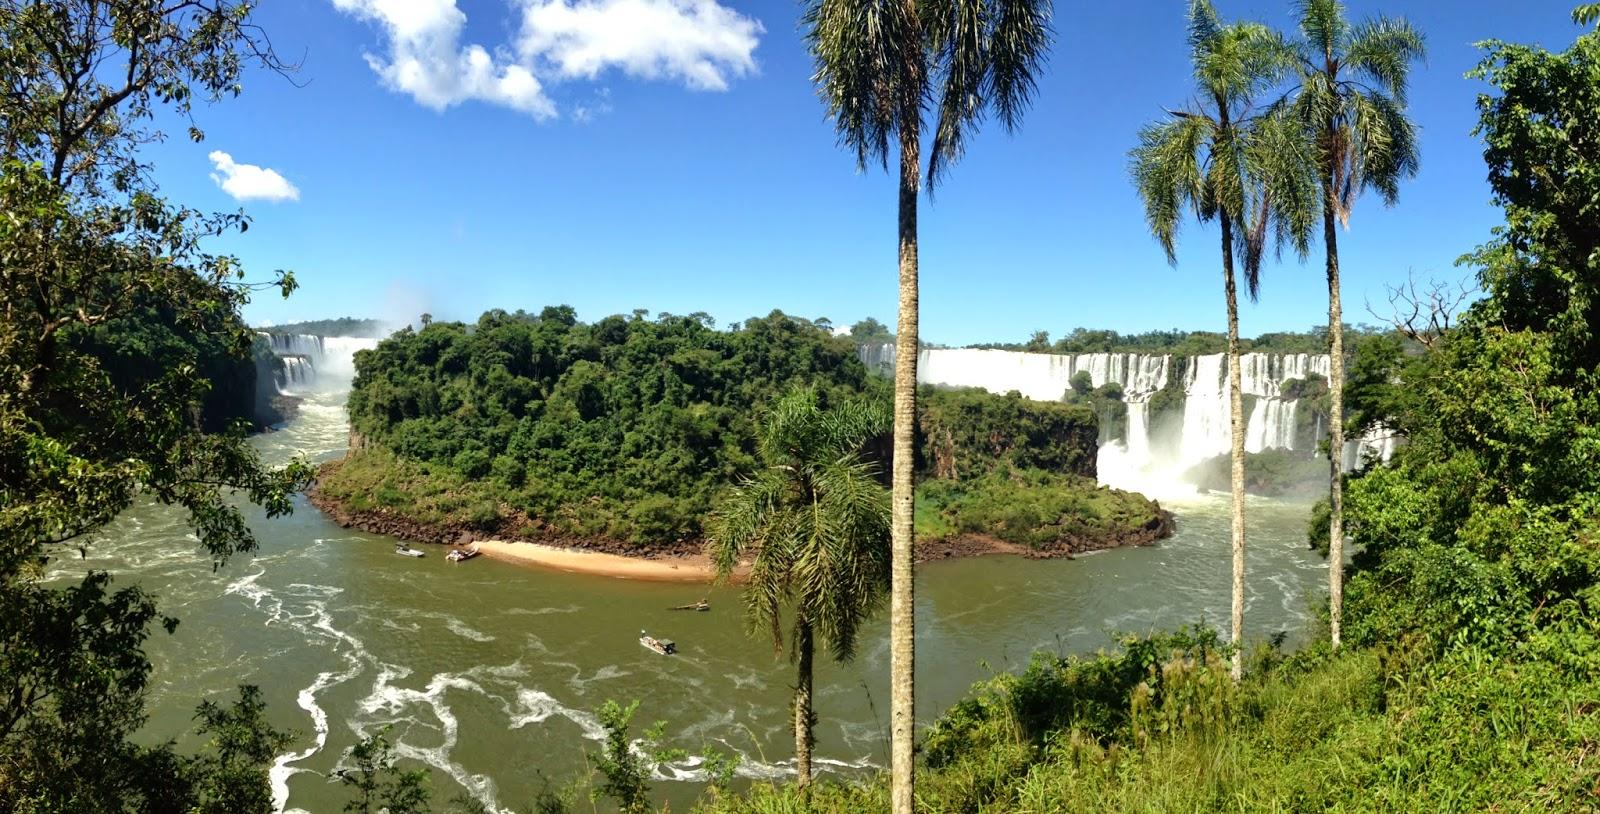 Iguazu Falls Puerto Iguazu Argentina